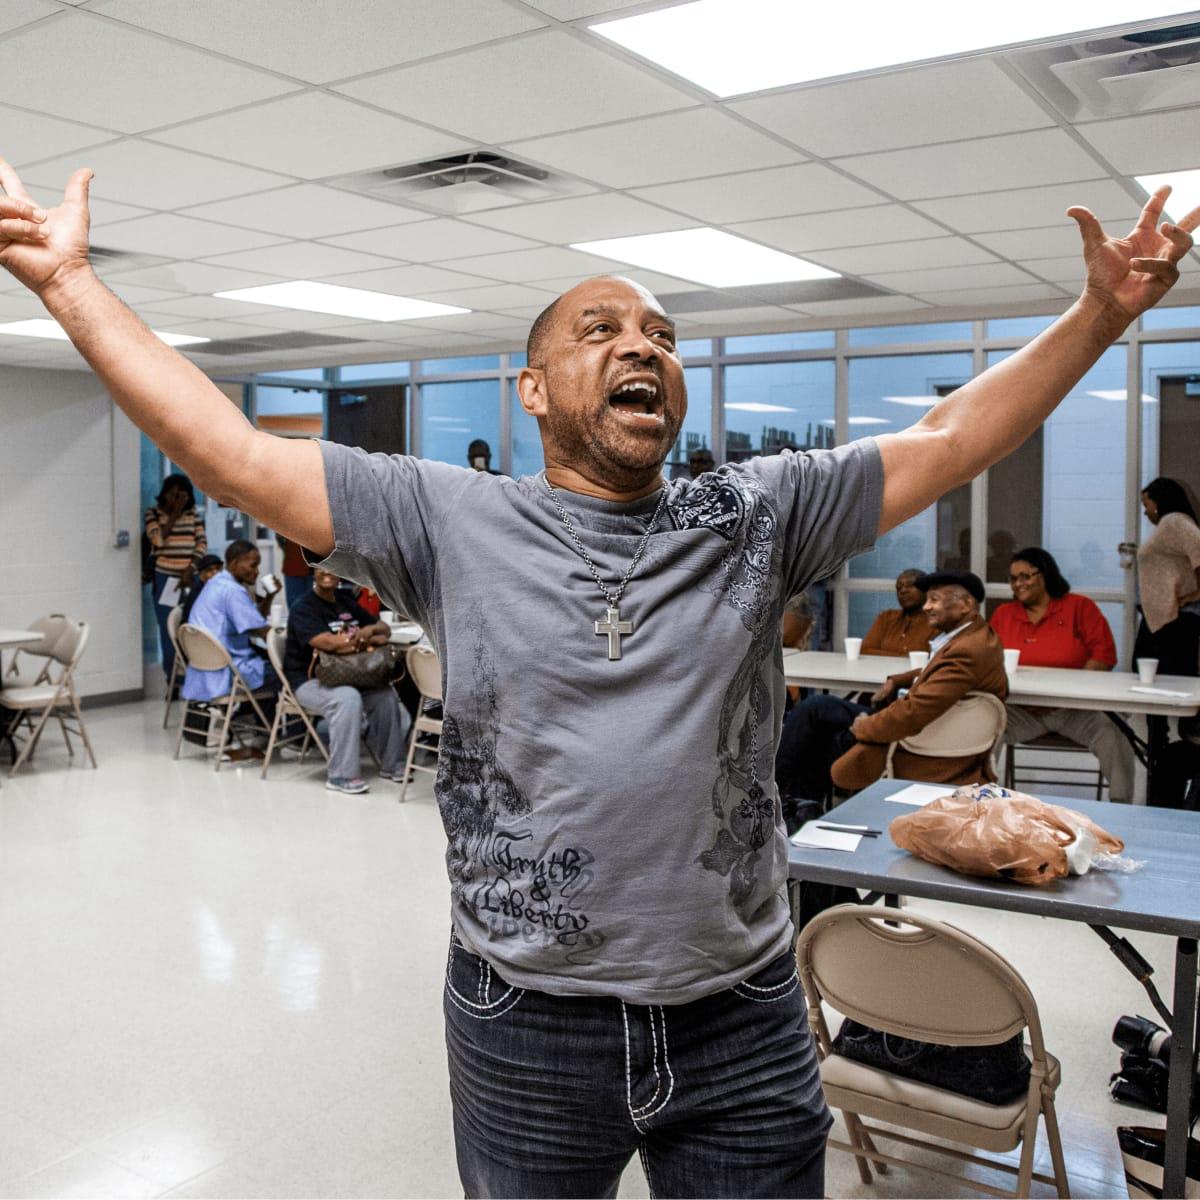 Hassan El-Amin teaching Public Works Dallas workshop at Cummings Recreation Center